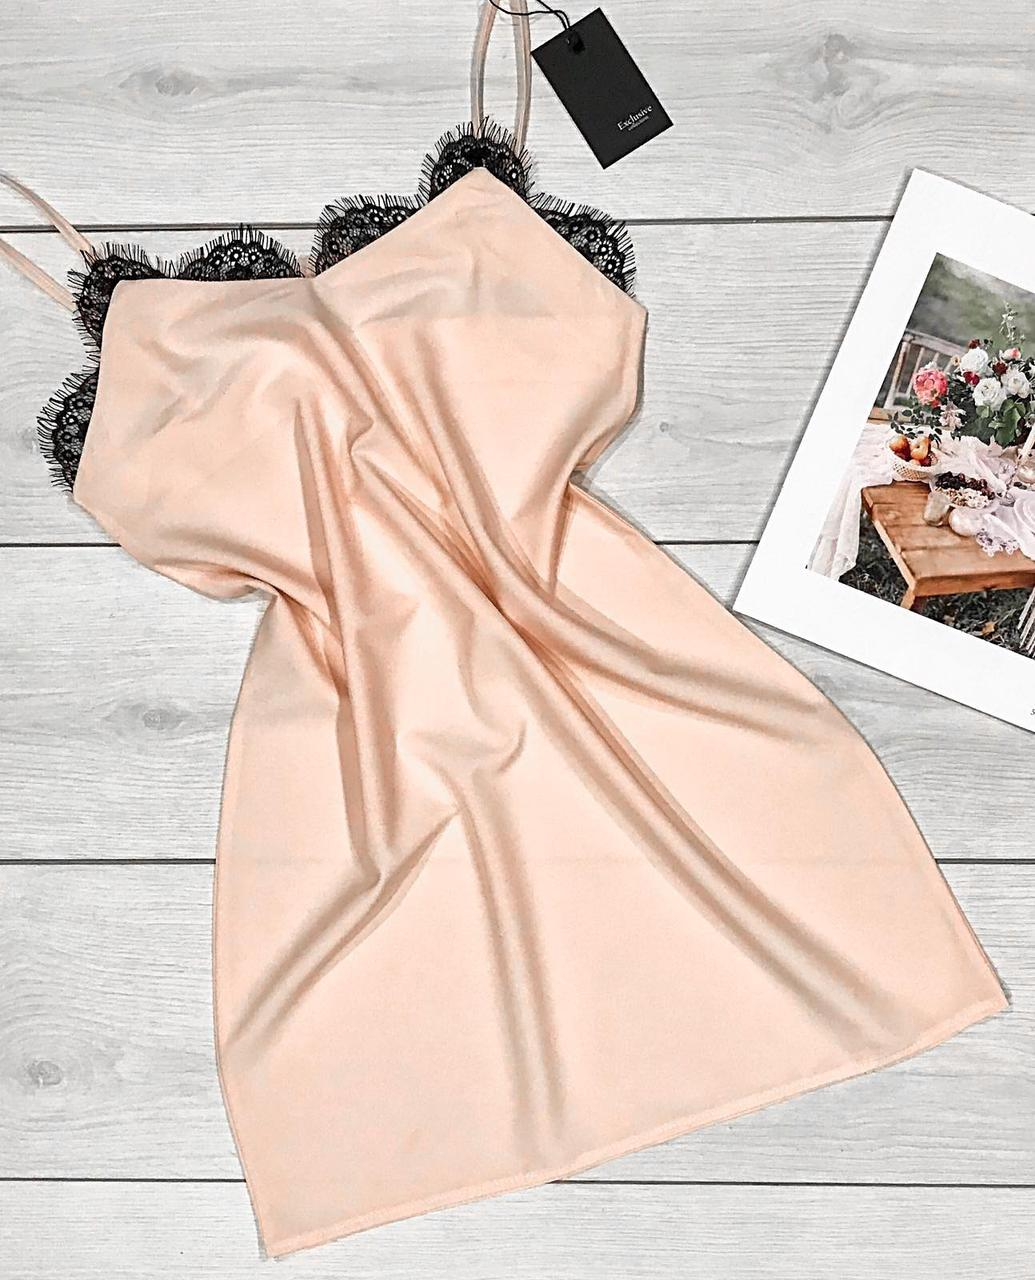 Бежевое домашнее платье-пеньюар с французским кружевом.